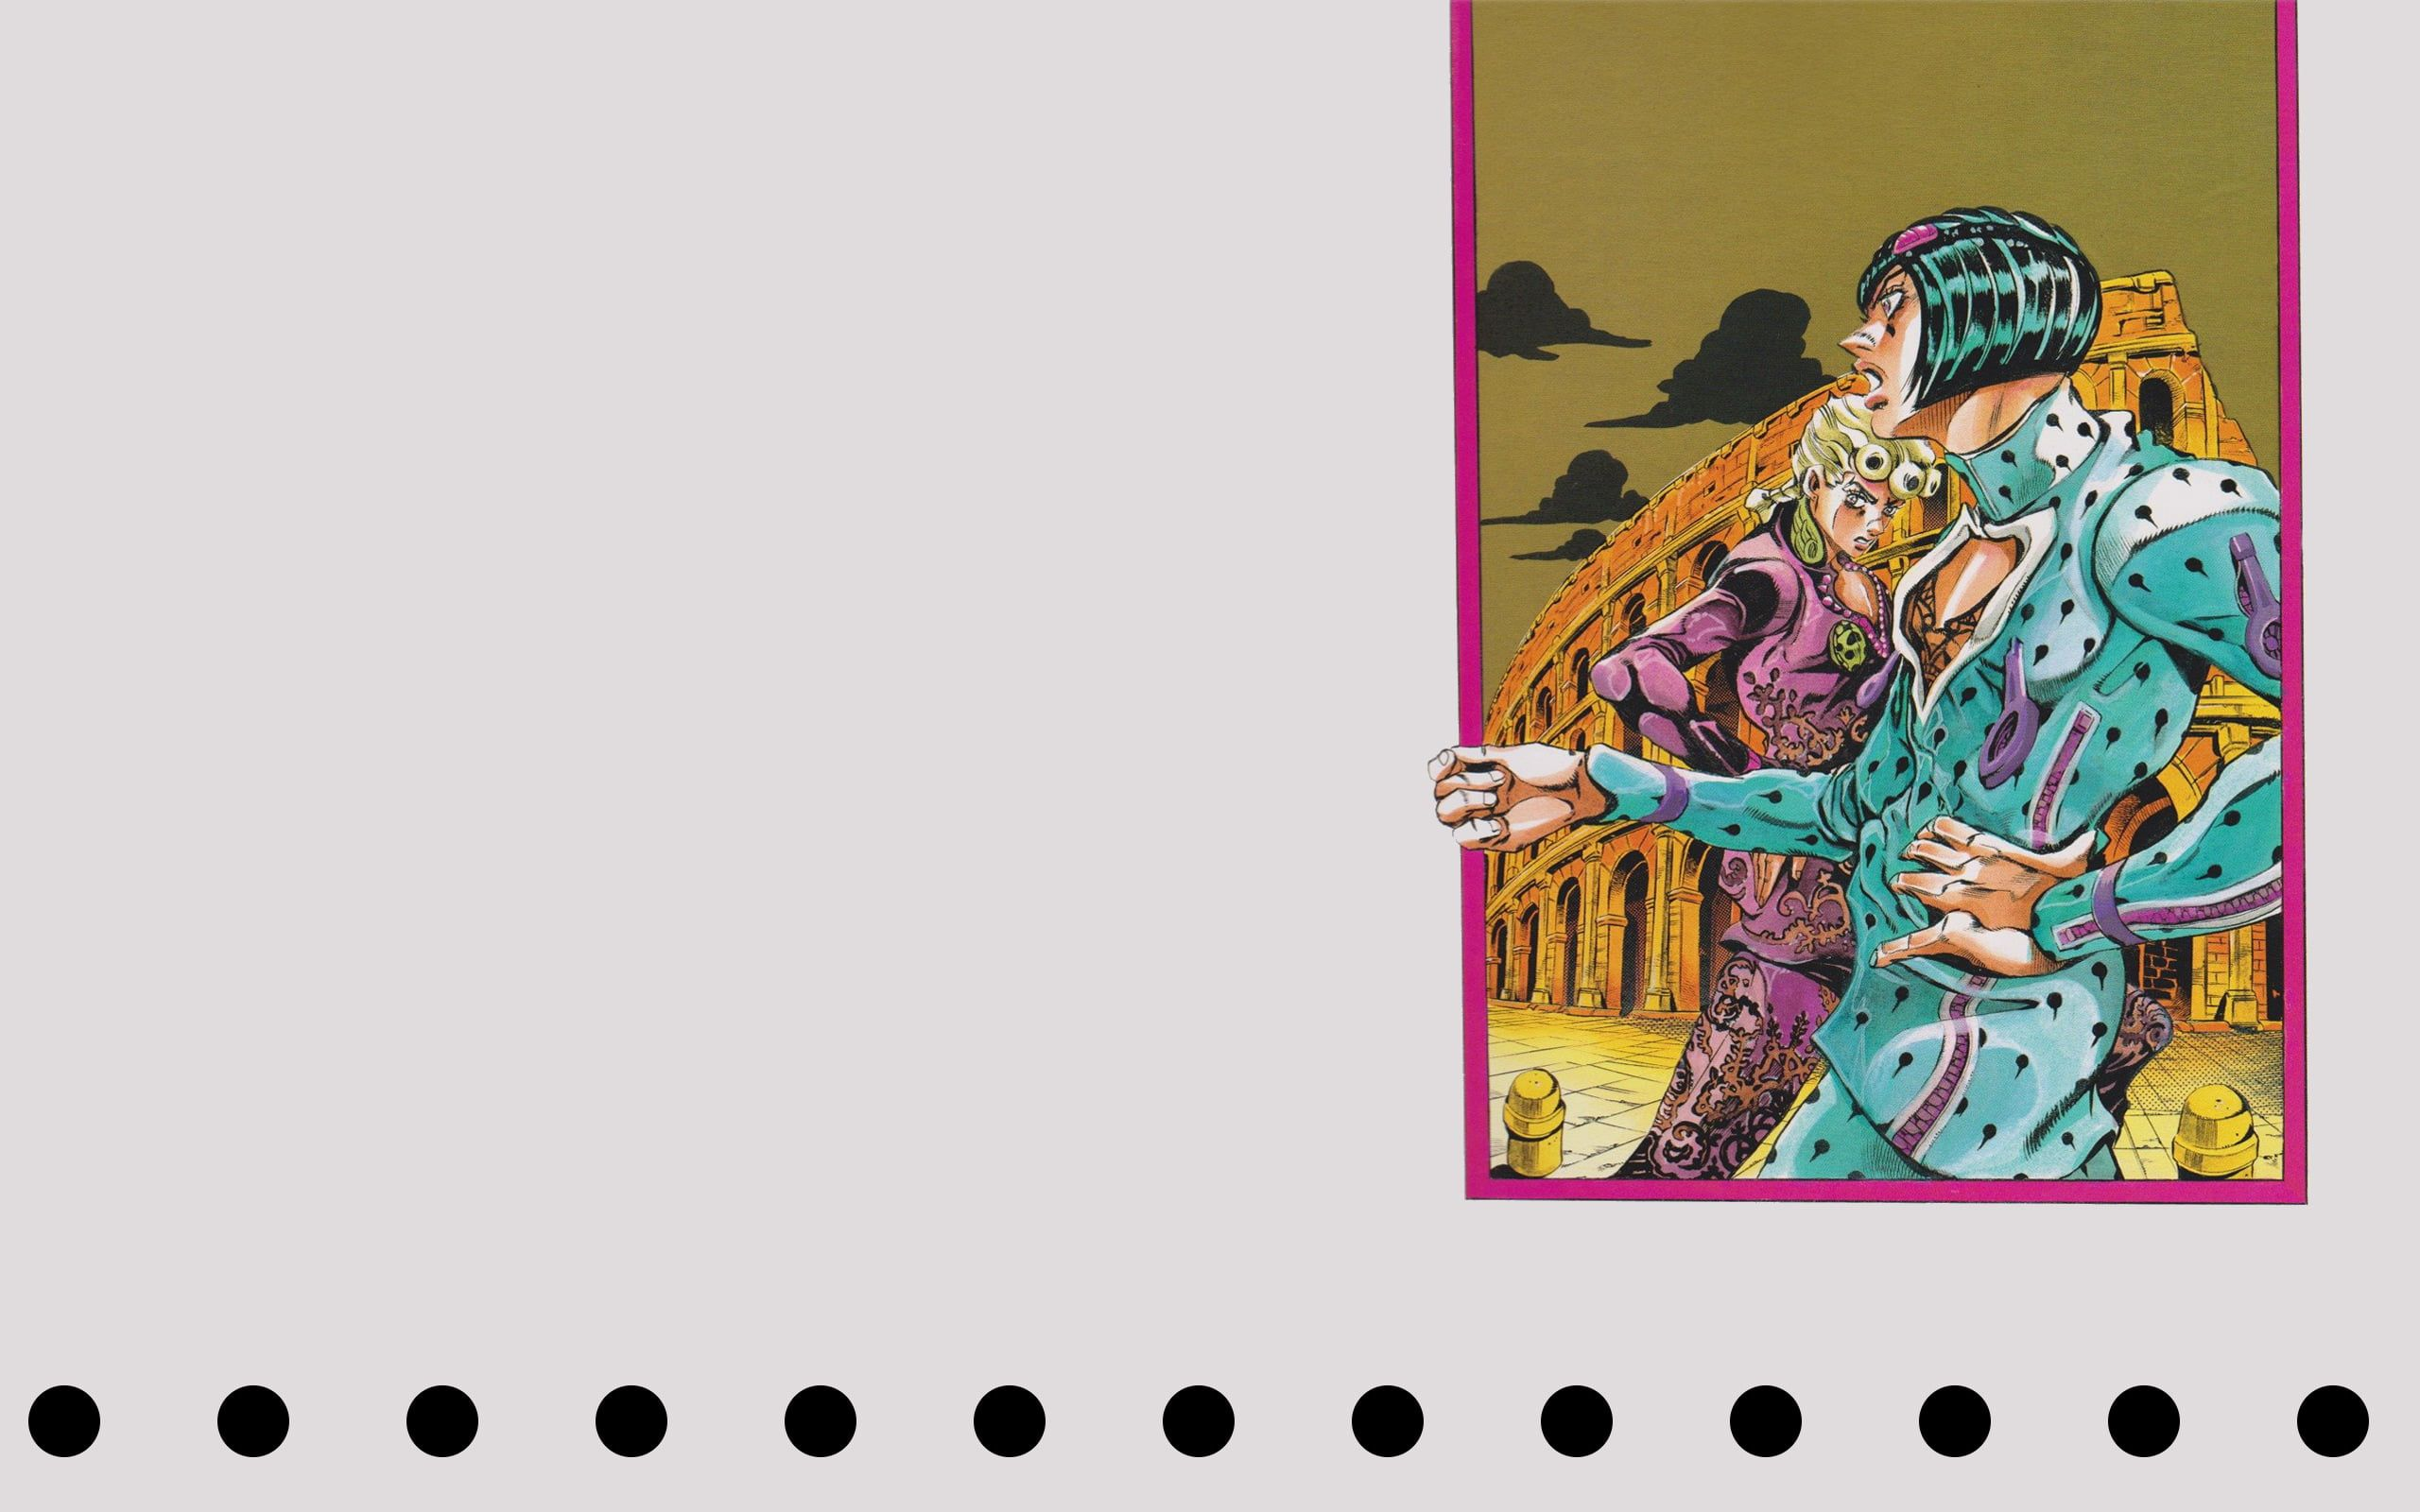 Jojo S Bizarre Adventure Anime Manga Hirohiko Araki Jojo S Bizarre Adventure Golden Wind Vento Aureo Giorno Giov In 2020 Jojo S Bizarre Adventure Jojo Bizarre Anime